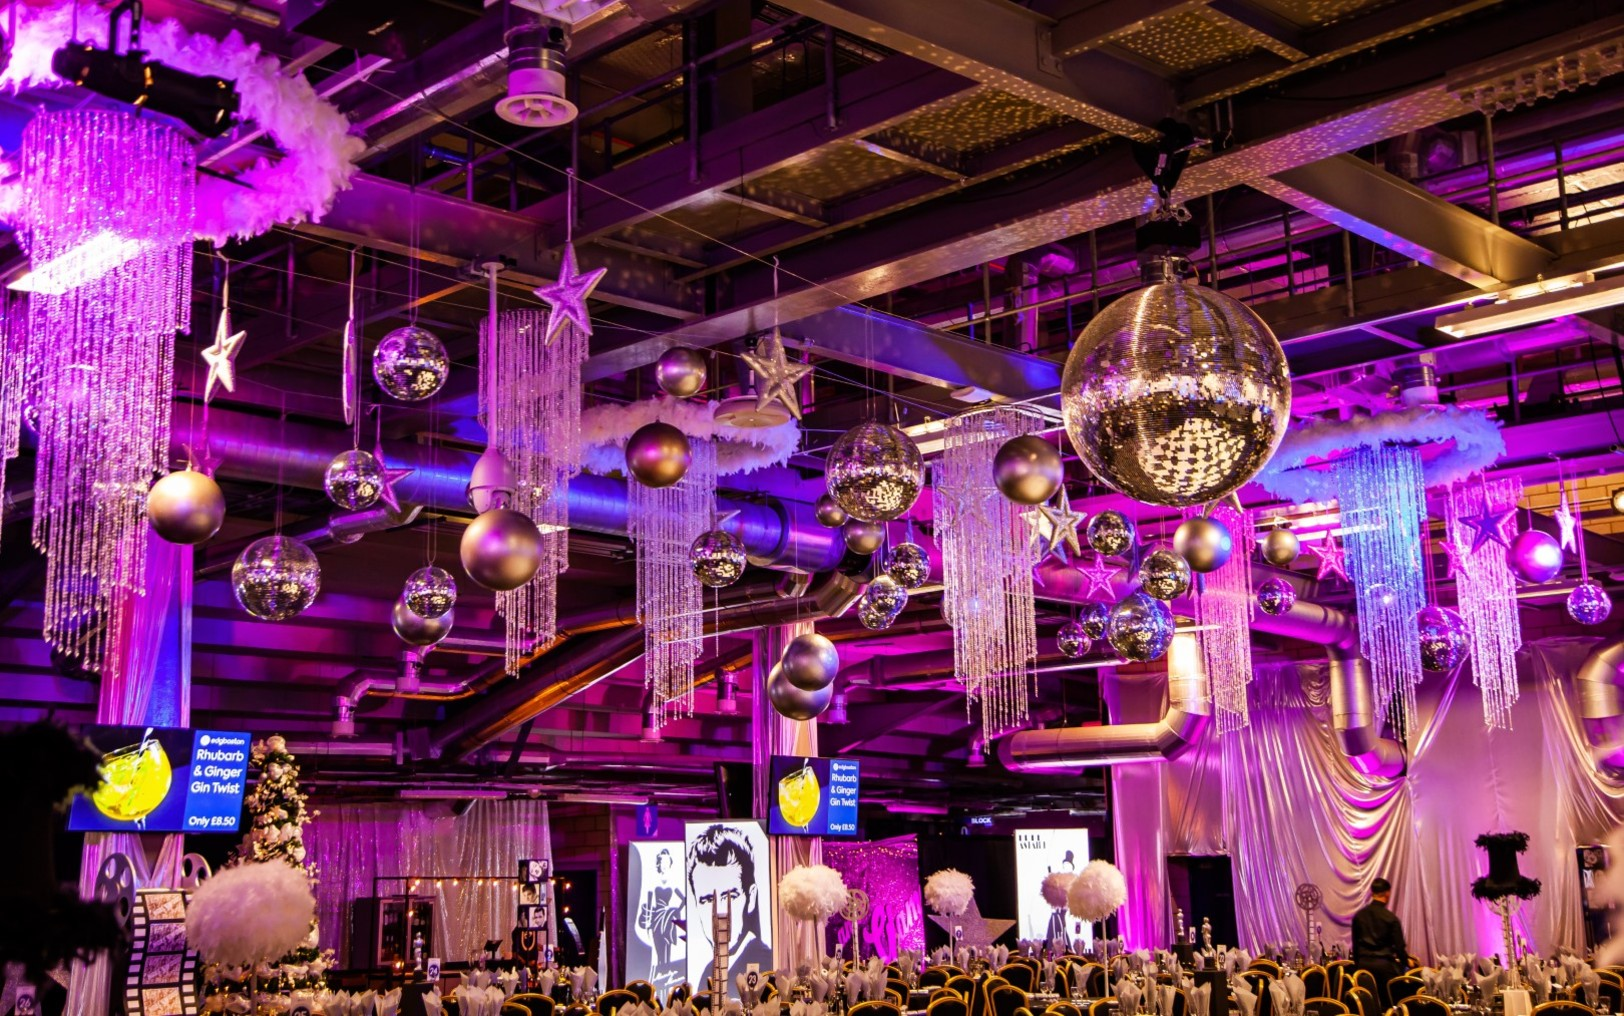 2020 Dj Christmas Partys Now Booking Edgbaston Events now taking bookings for Christmas Party Nights